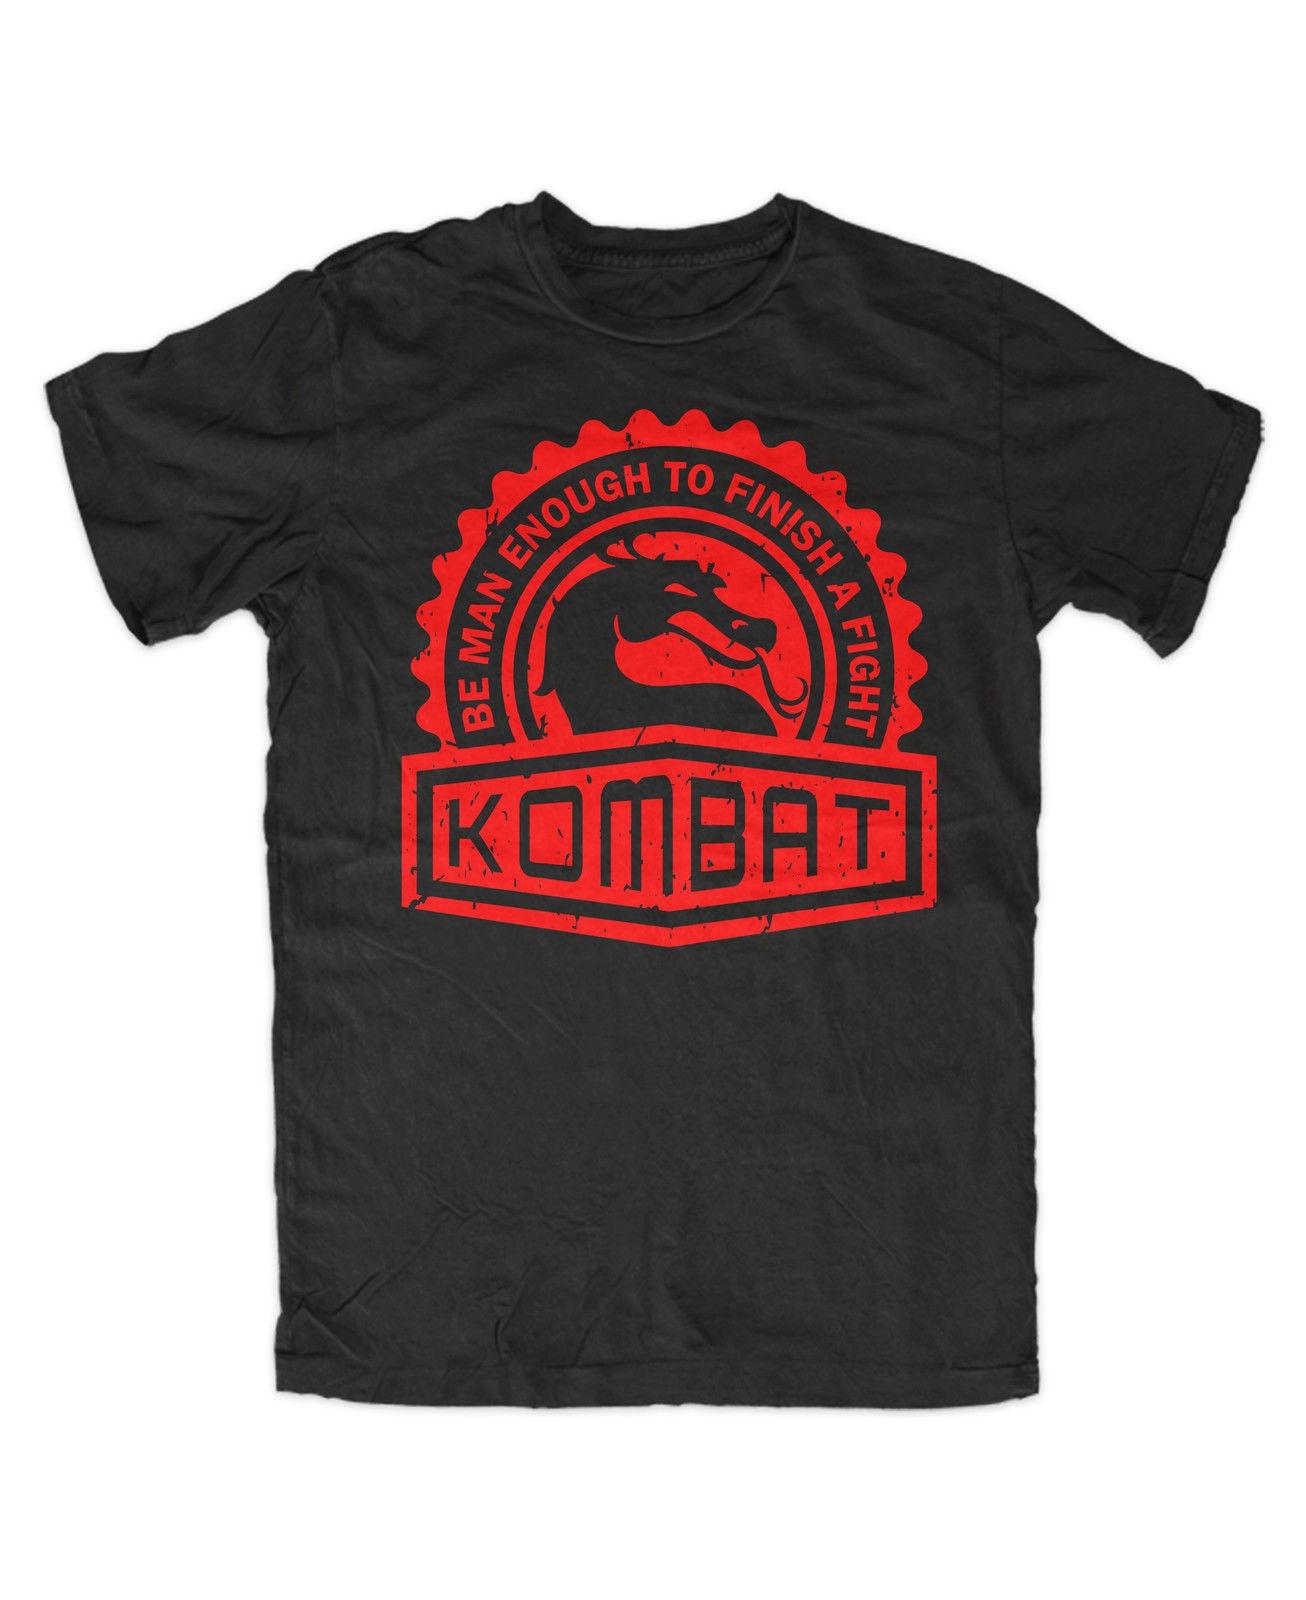 Kombat Premium T-Shirt Game,Gamer,Nerd,Retro,Fun,Kult,Arcade,Mortal